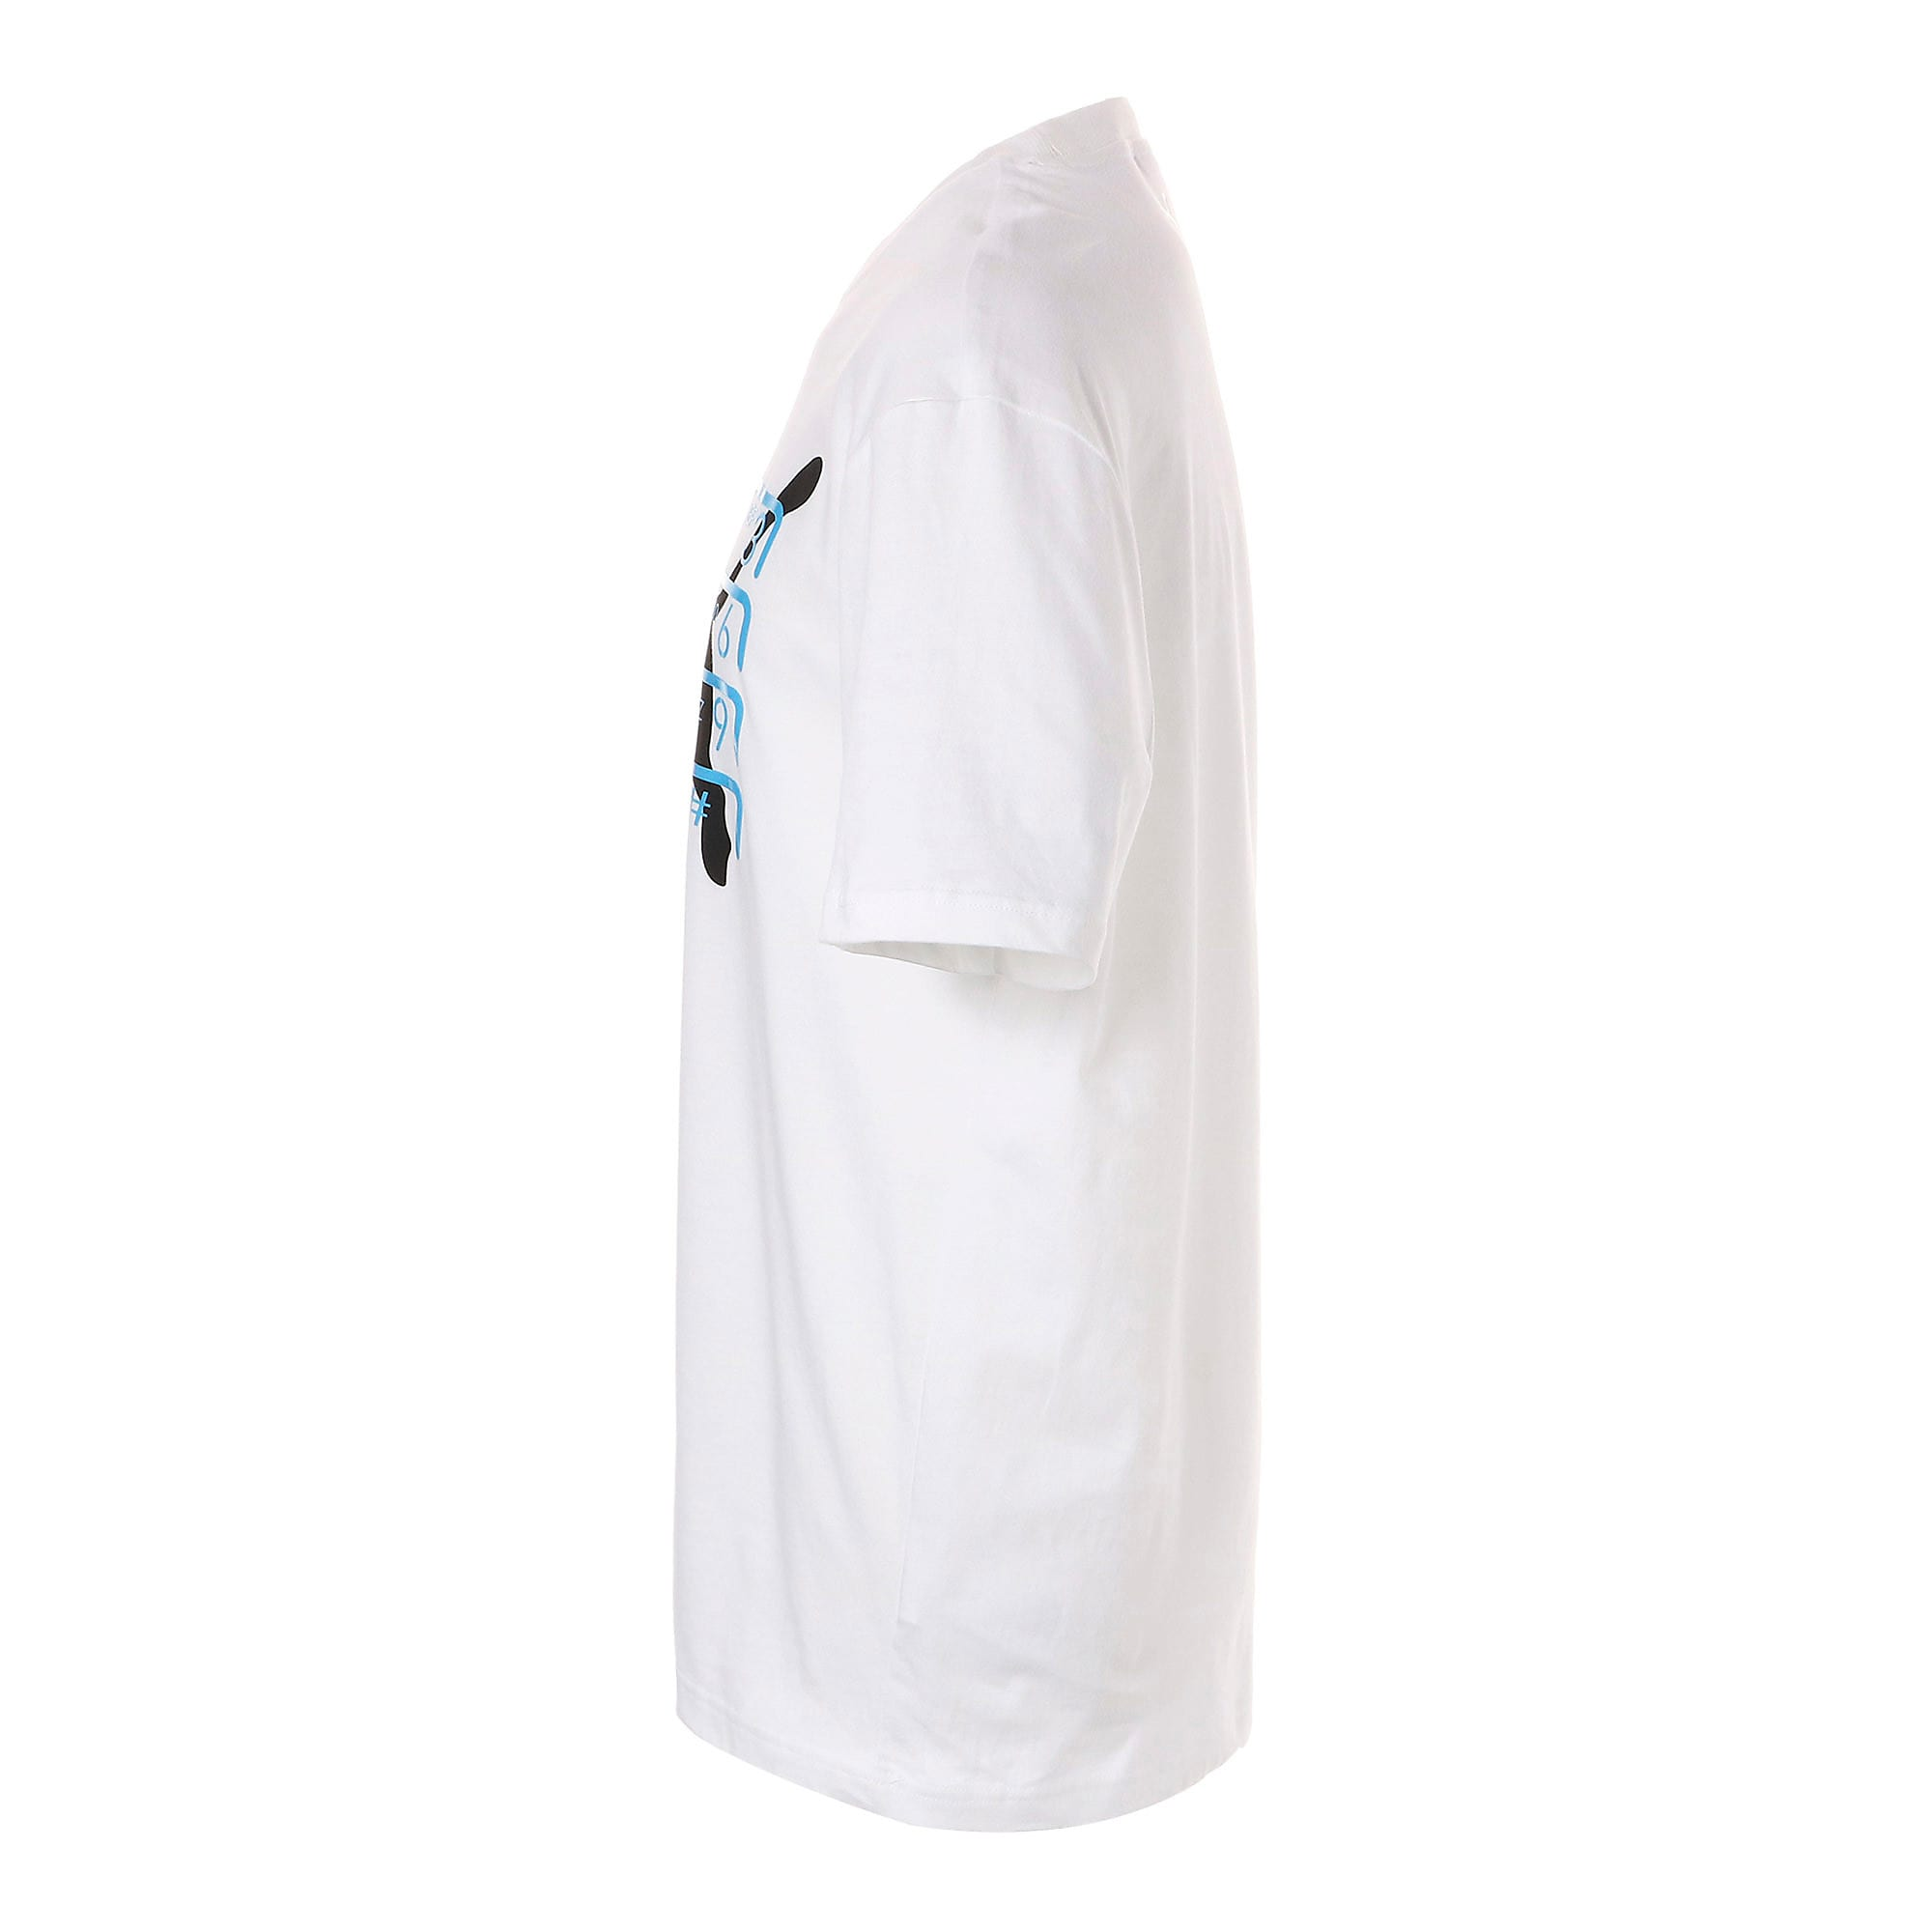 Thumbnail 2 of PUMA x MOTOROLA Tシャツ, Puma White, medium-JPN